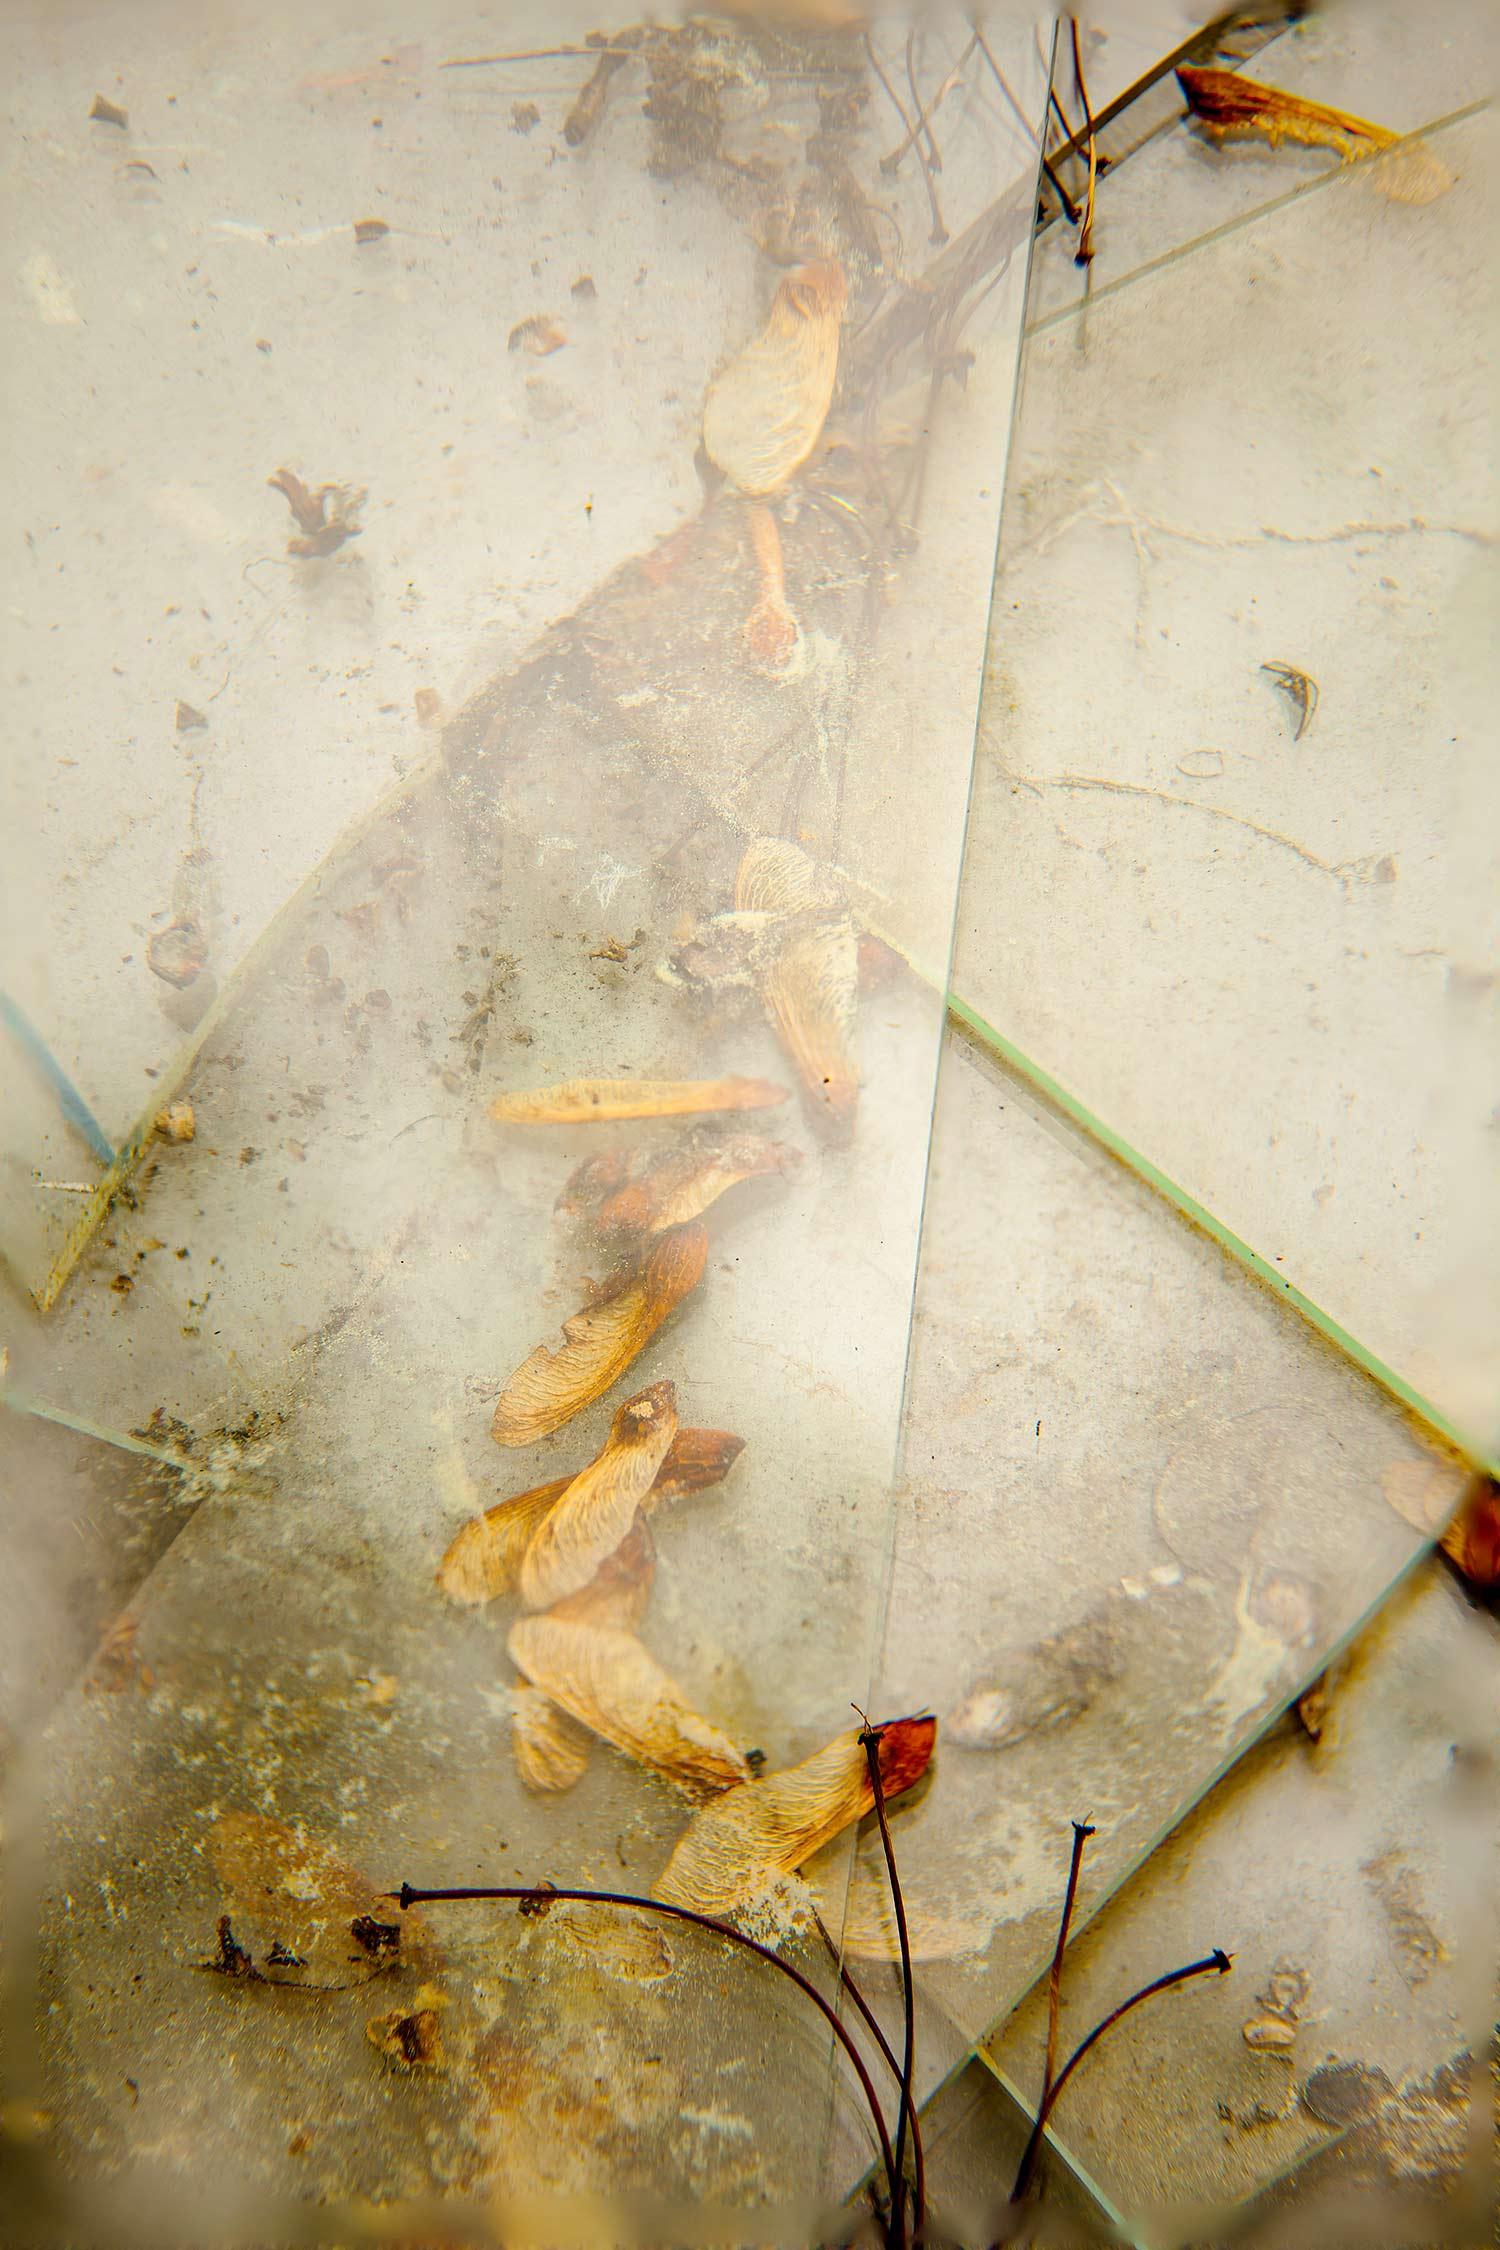 Seeds and Glass, Bar Harbor, Maine, 2013